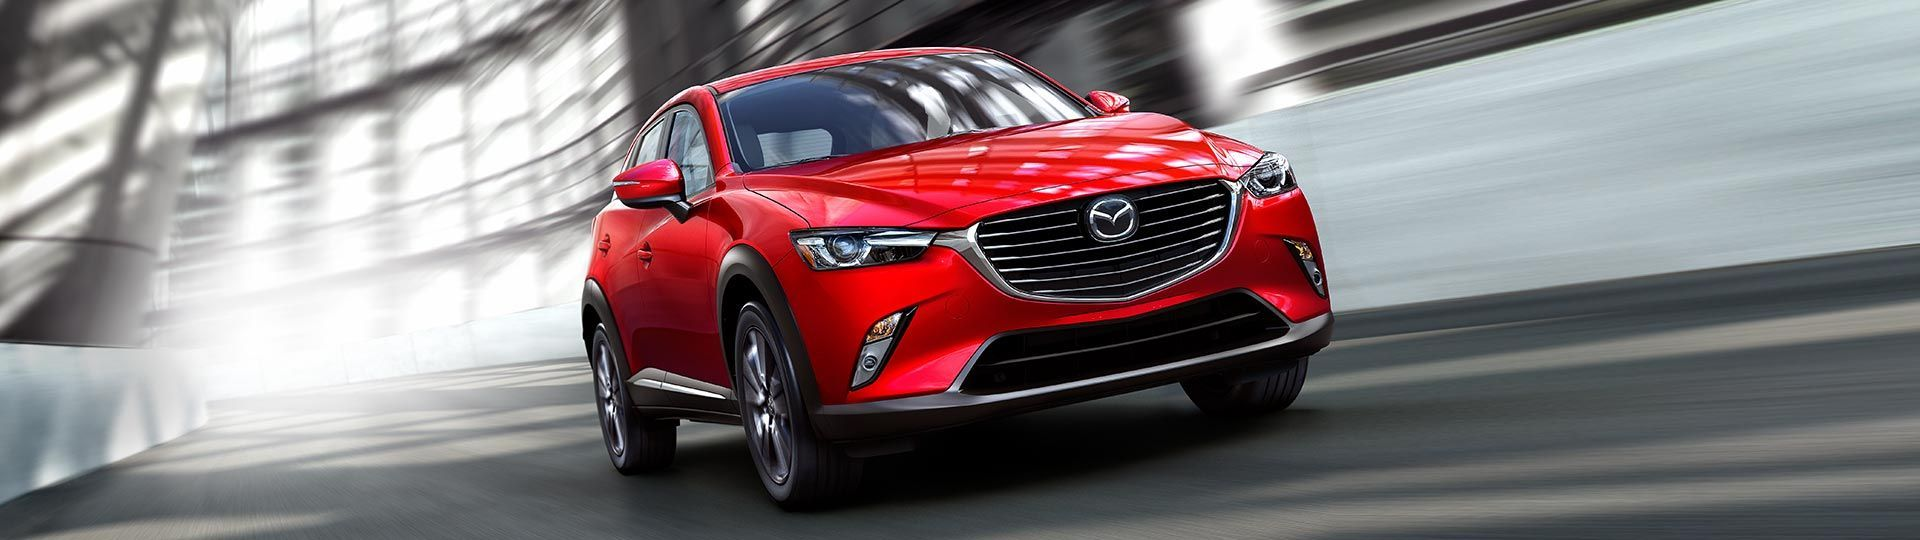 models cx crystal row gt suv passenger red soul mazda car vehicles usa